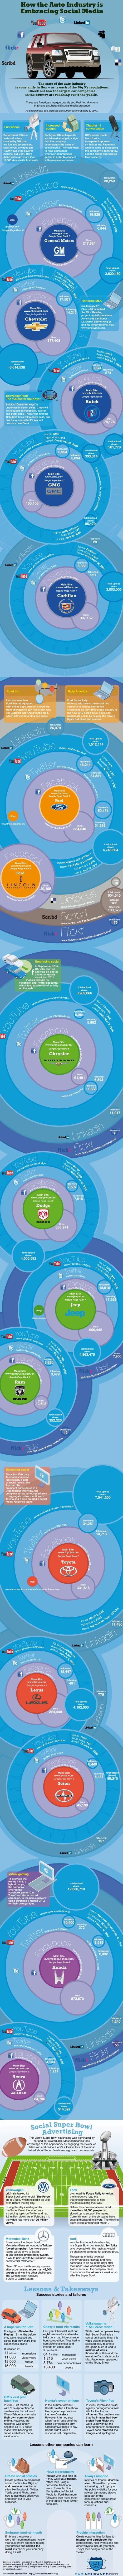 2013 Social Media Marketing Predictions for Car Dealers | Car Industry Insight | Scoop.it